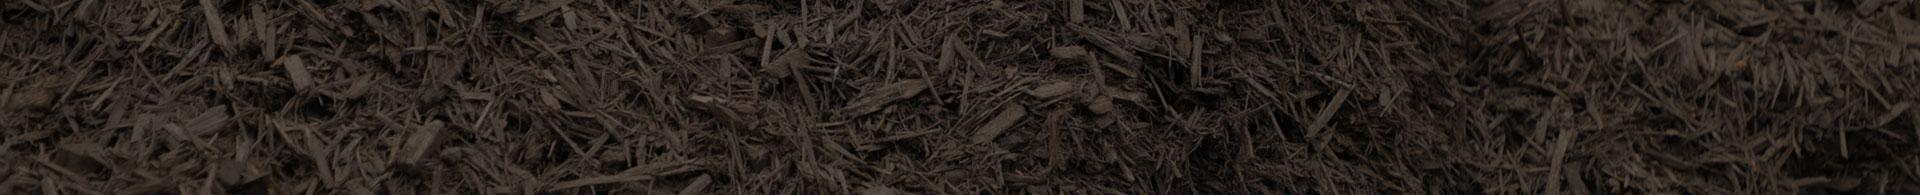 Gro-Bark® Mulch